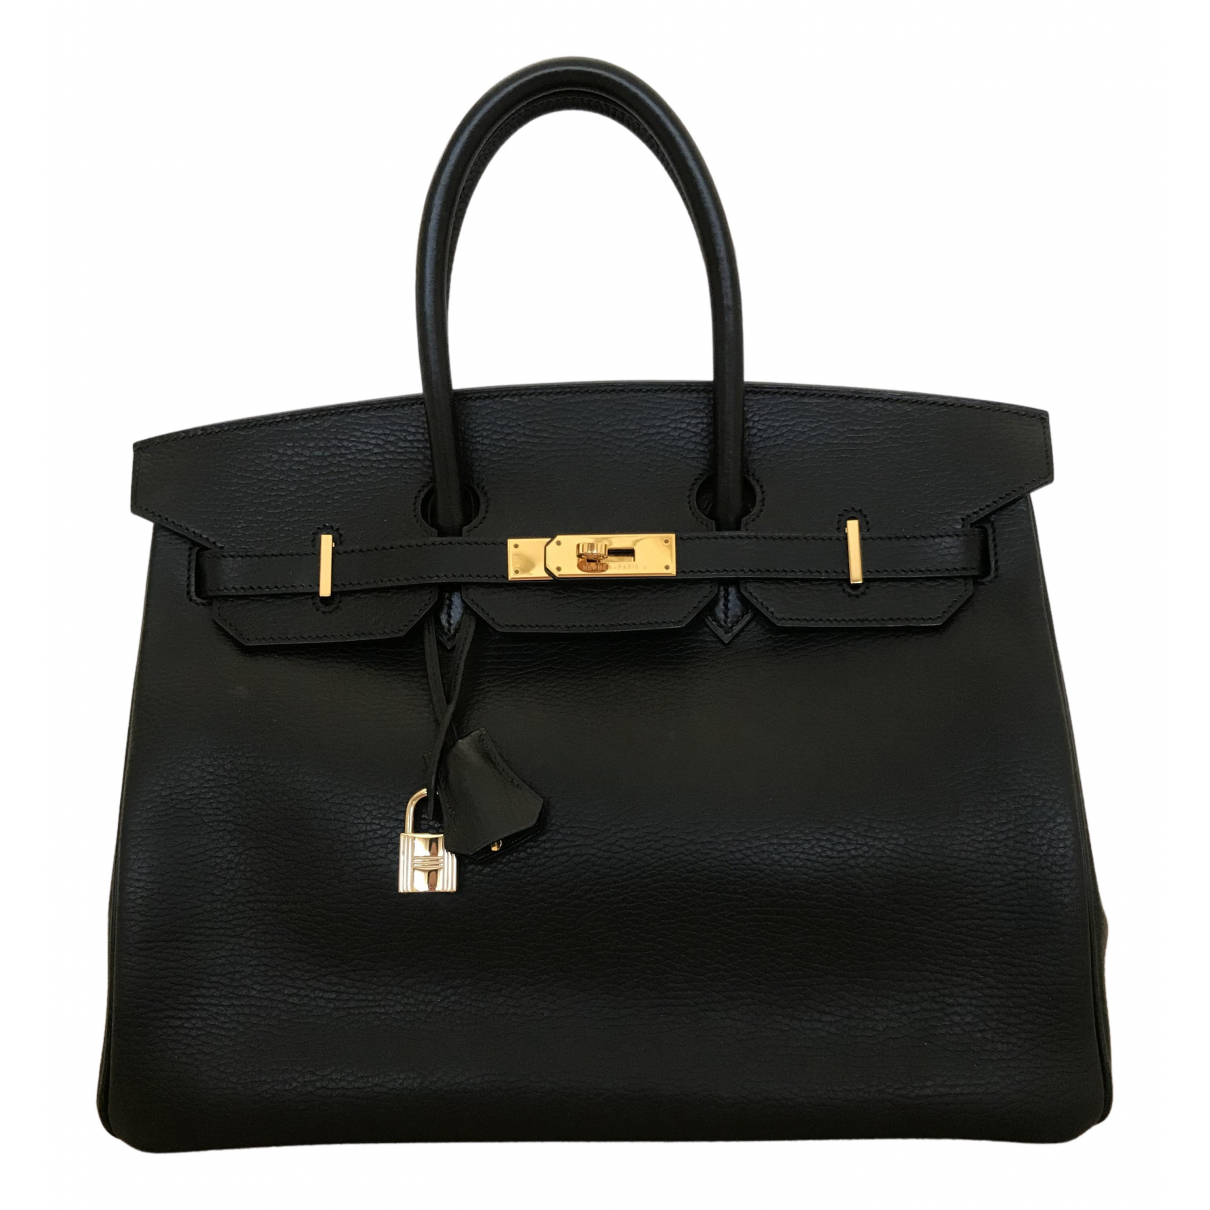 Hermès Birkin 35 Black Leather handbag for Women N